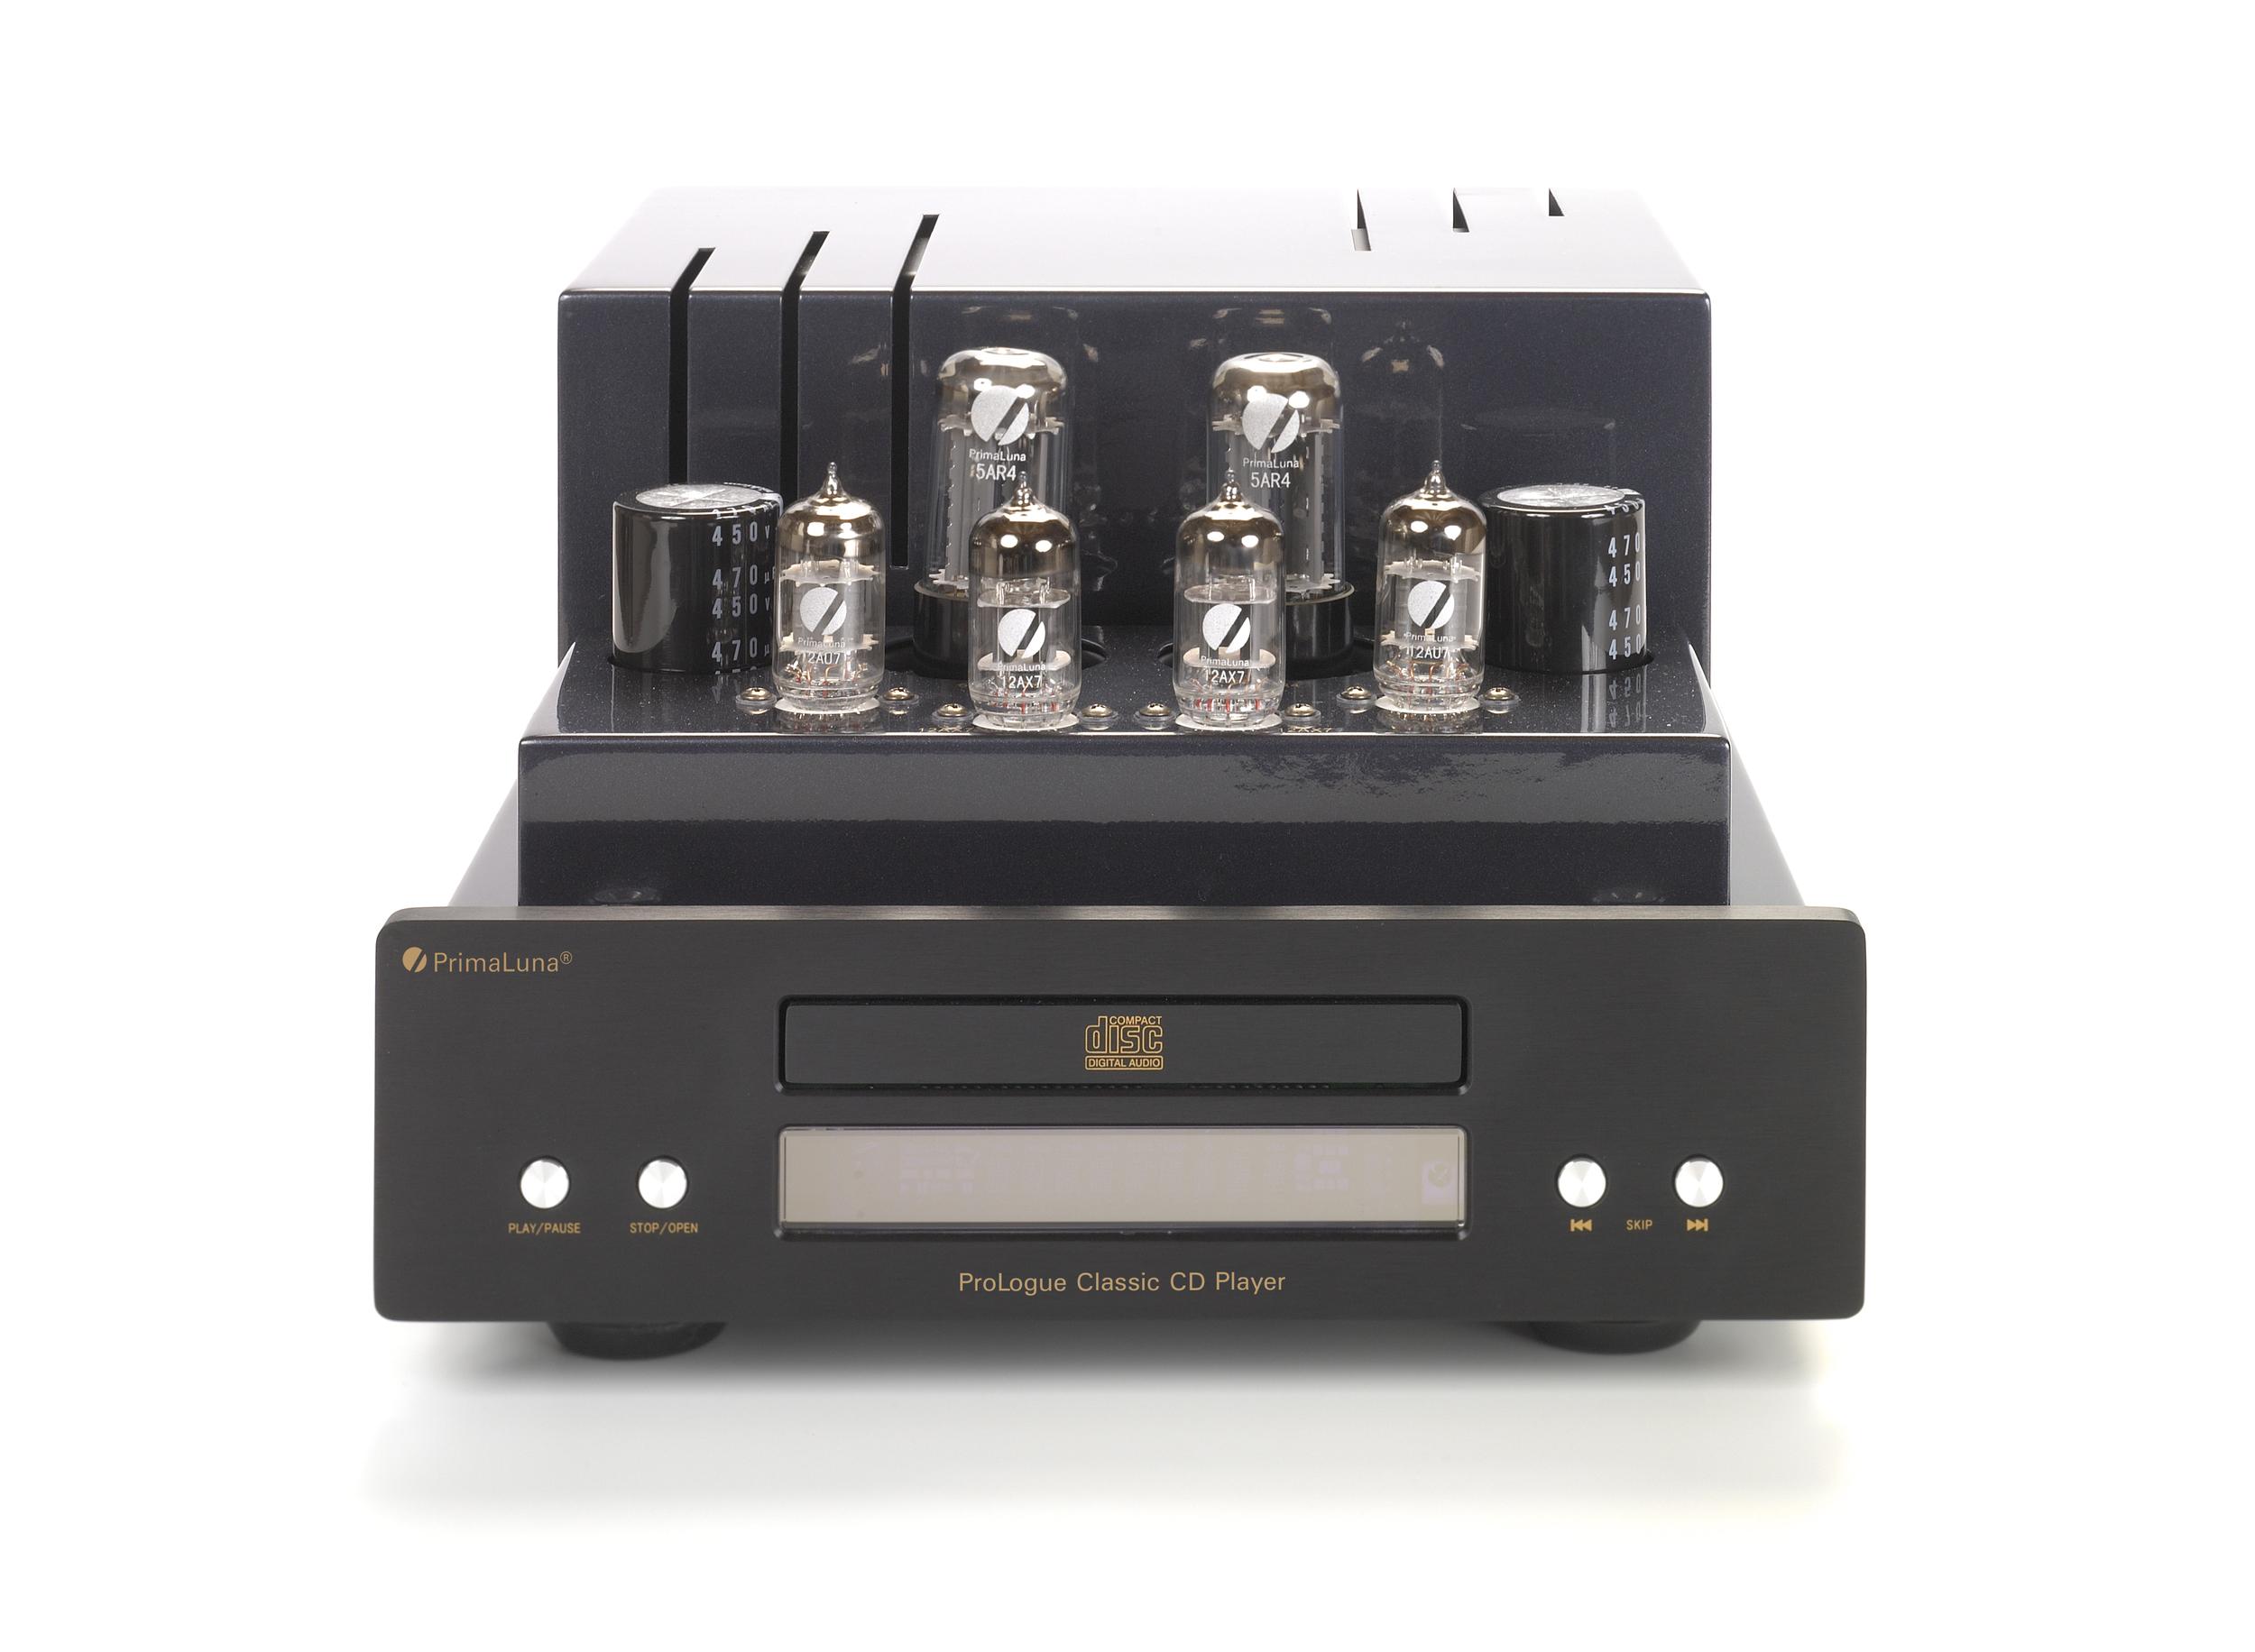 015-PrimaLuna Classic CD Player-zwart.jpg